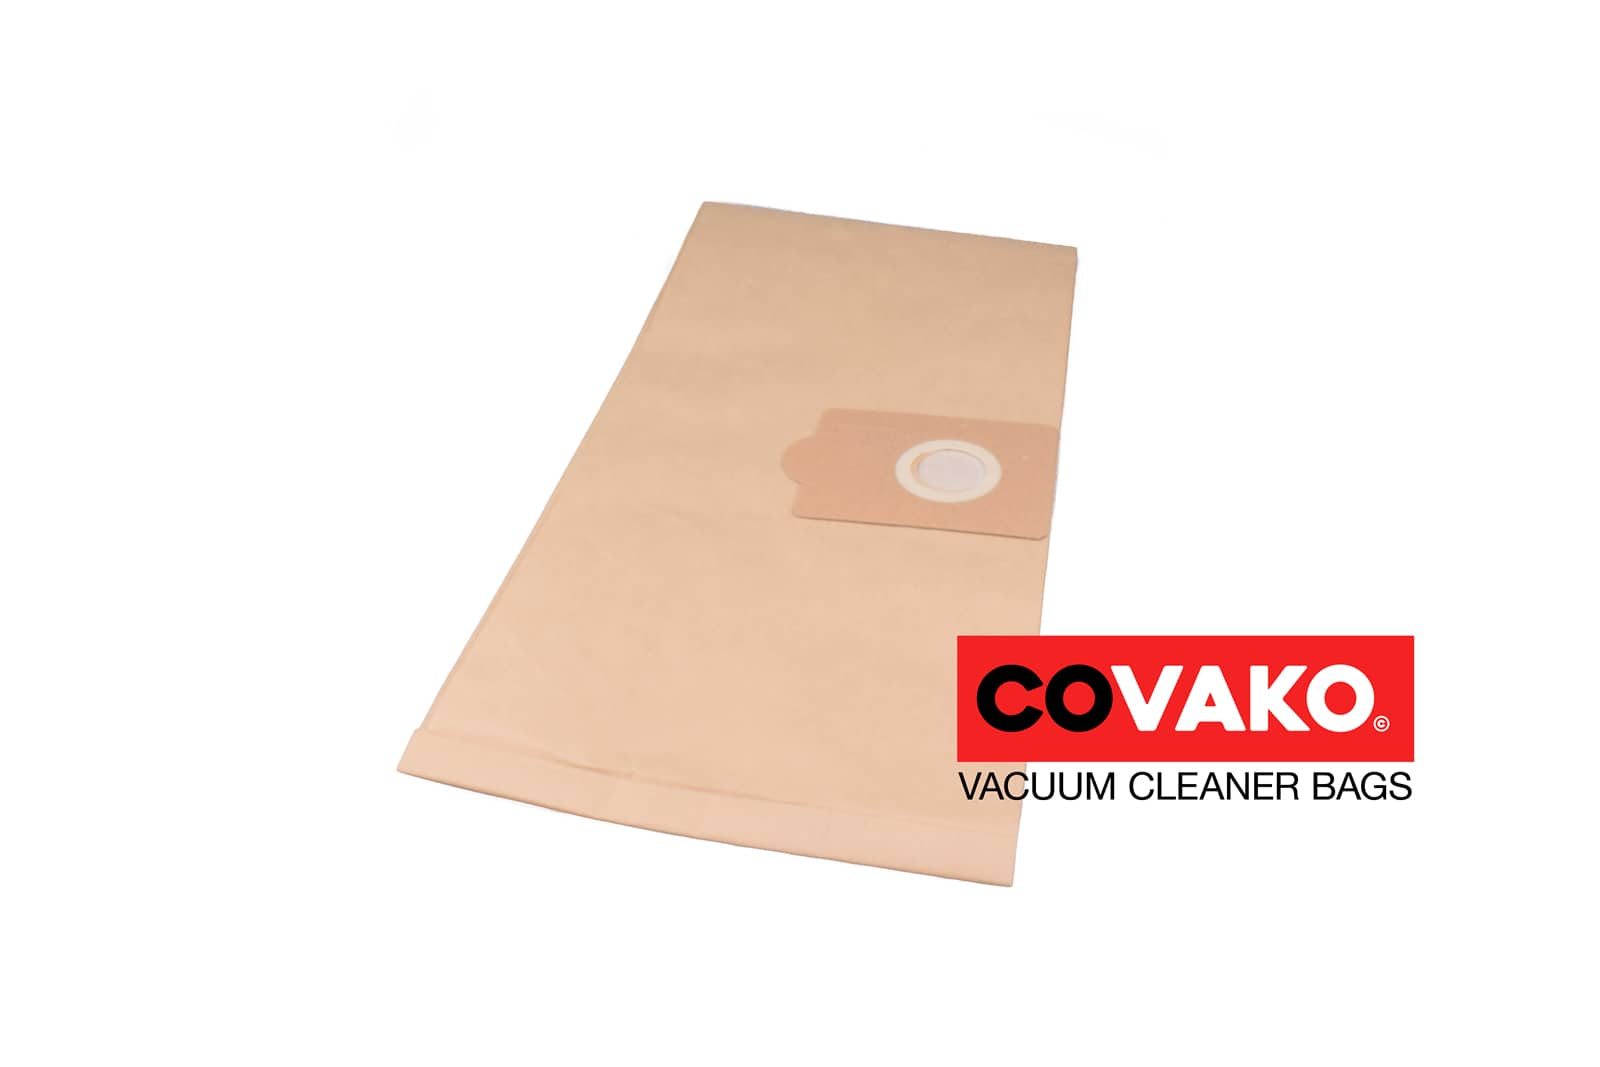 Kenbo Silent 25 / Paper - Kenbo vacuum cleaner bags